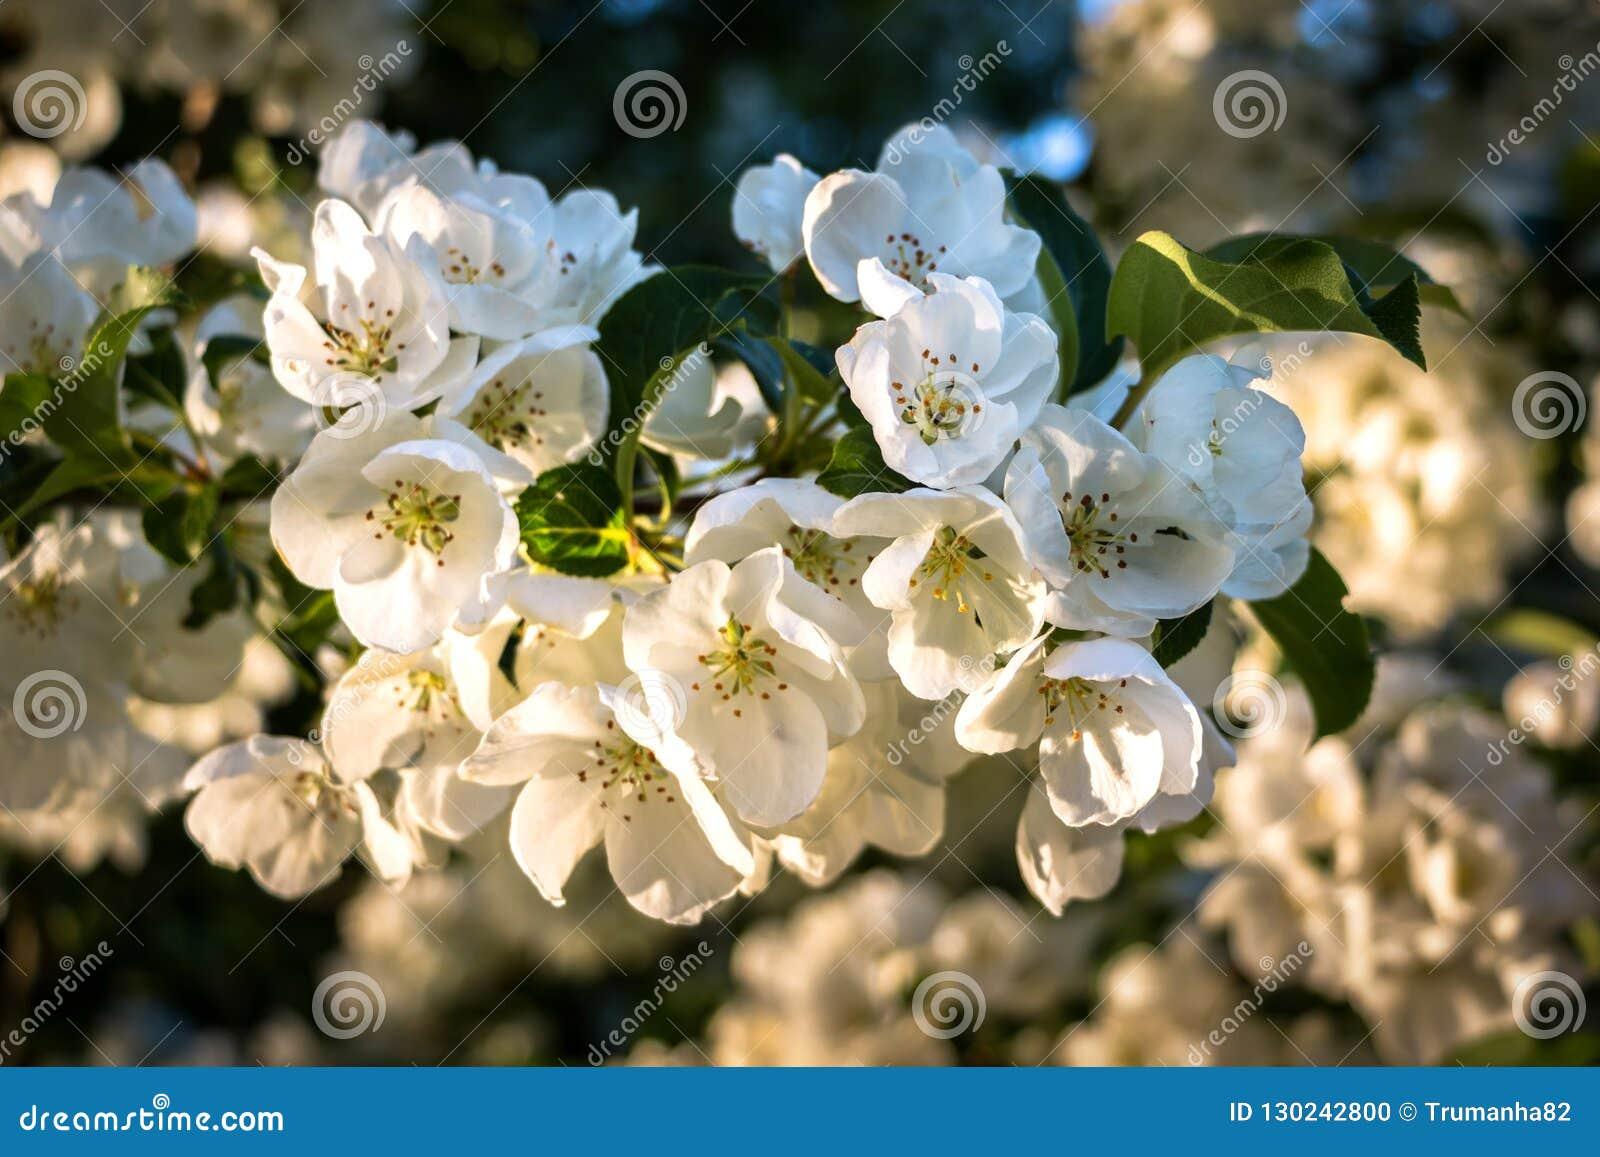 Macro Shot of White Cherry Blossoms in Spring Sunshine